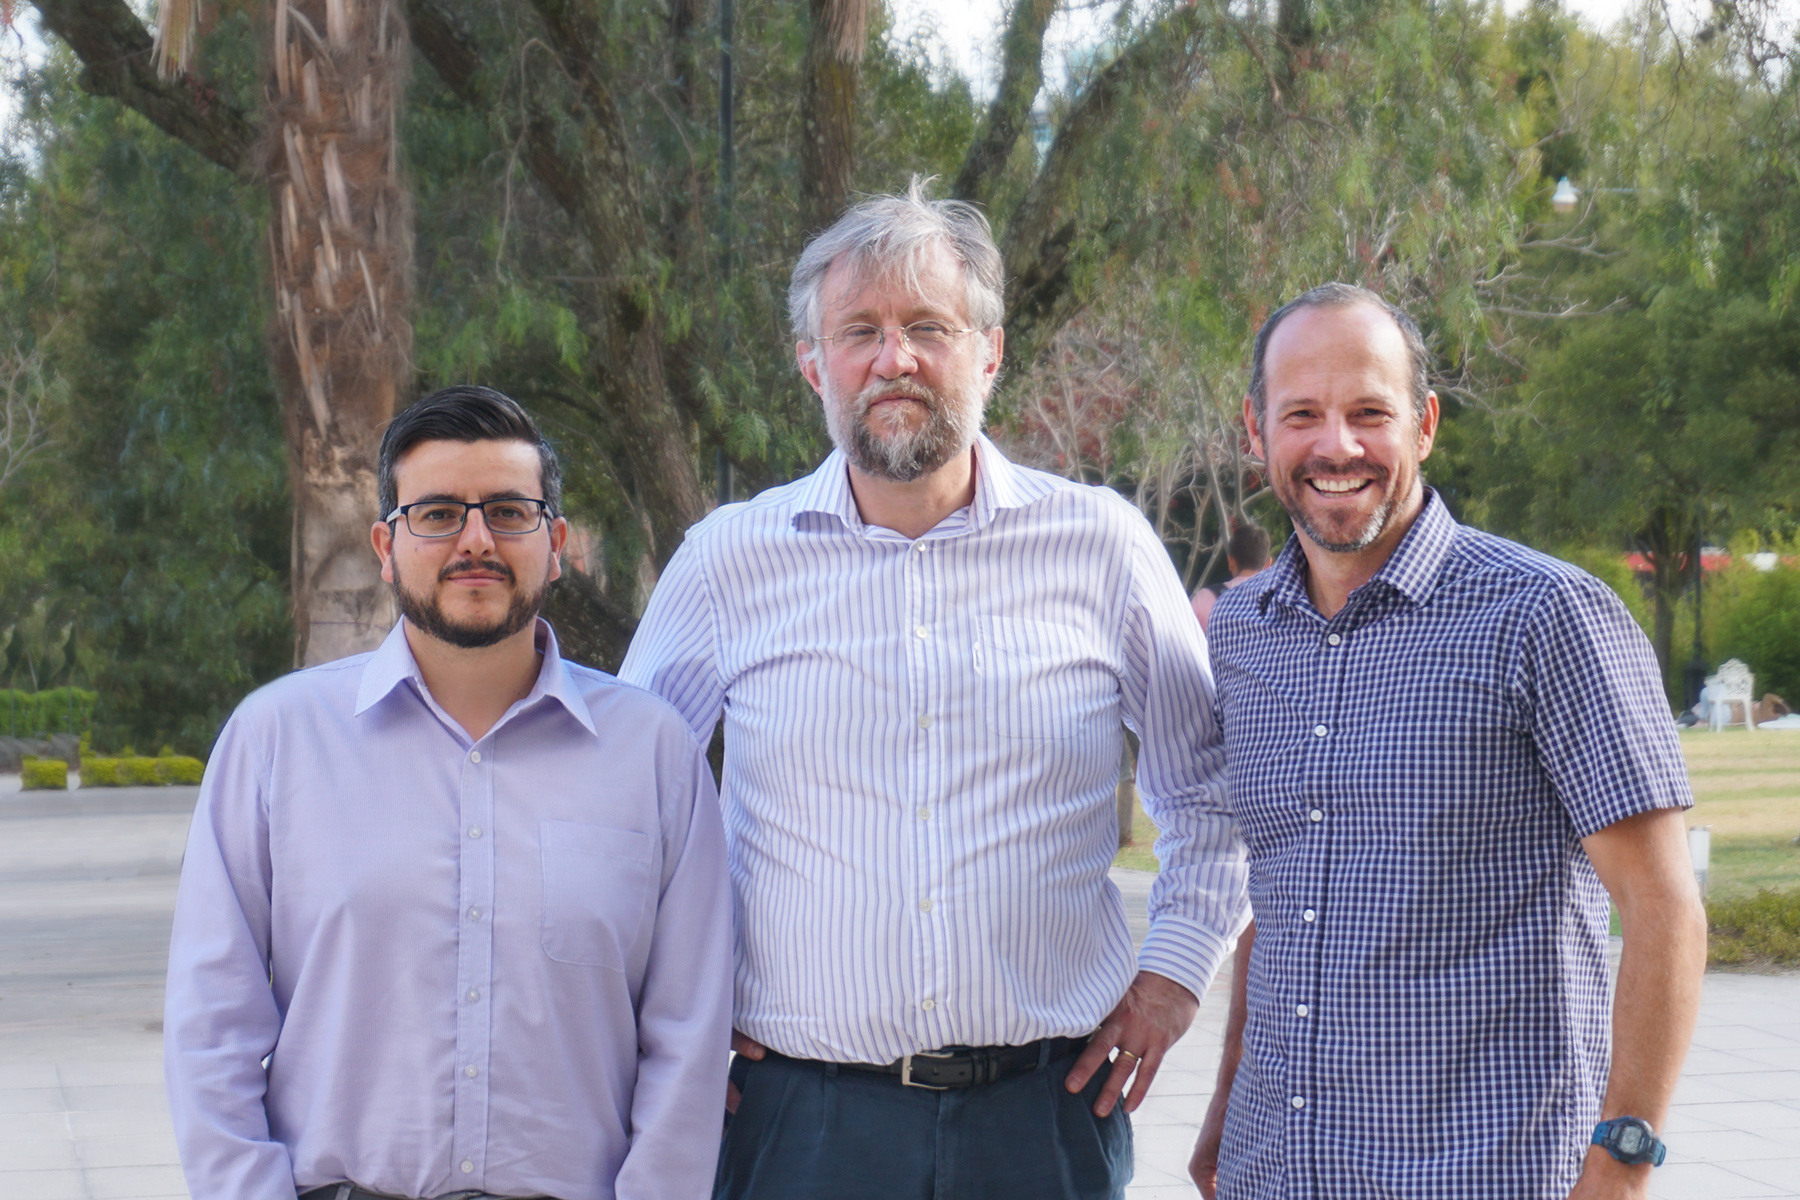 Universidad San Francisco de Quito, Ecuador -Paul Cardenas MD PhD (GHES 2018-2019), Gabriel Trueba DVM MS PhD (GHES Mentor), and Jay Graham PhD MBA MPH (GHES Mentor).